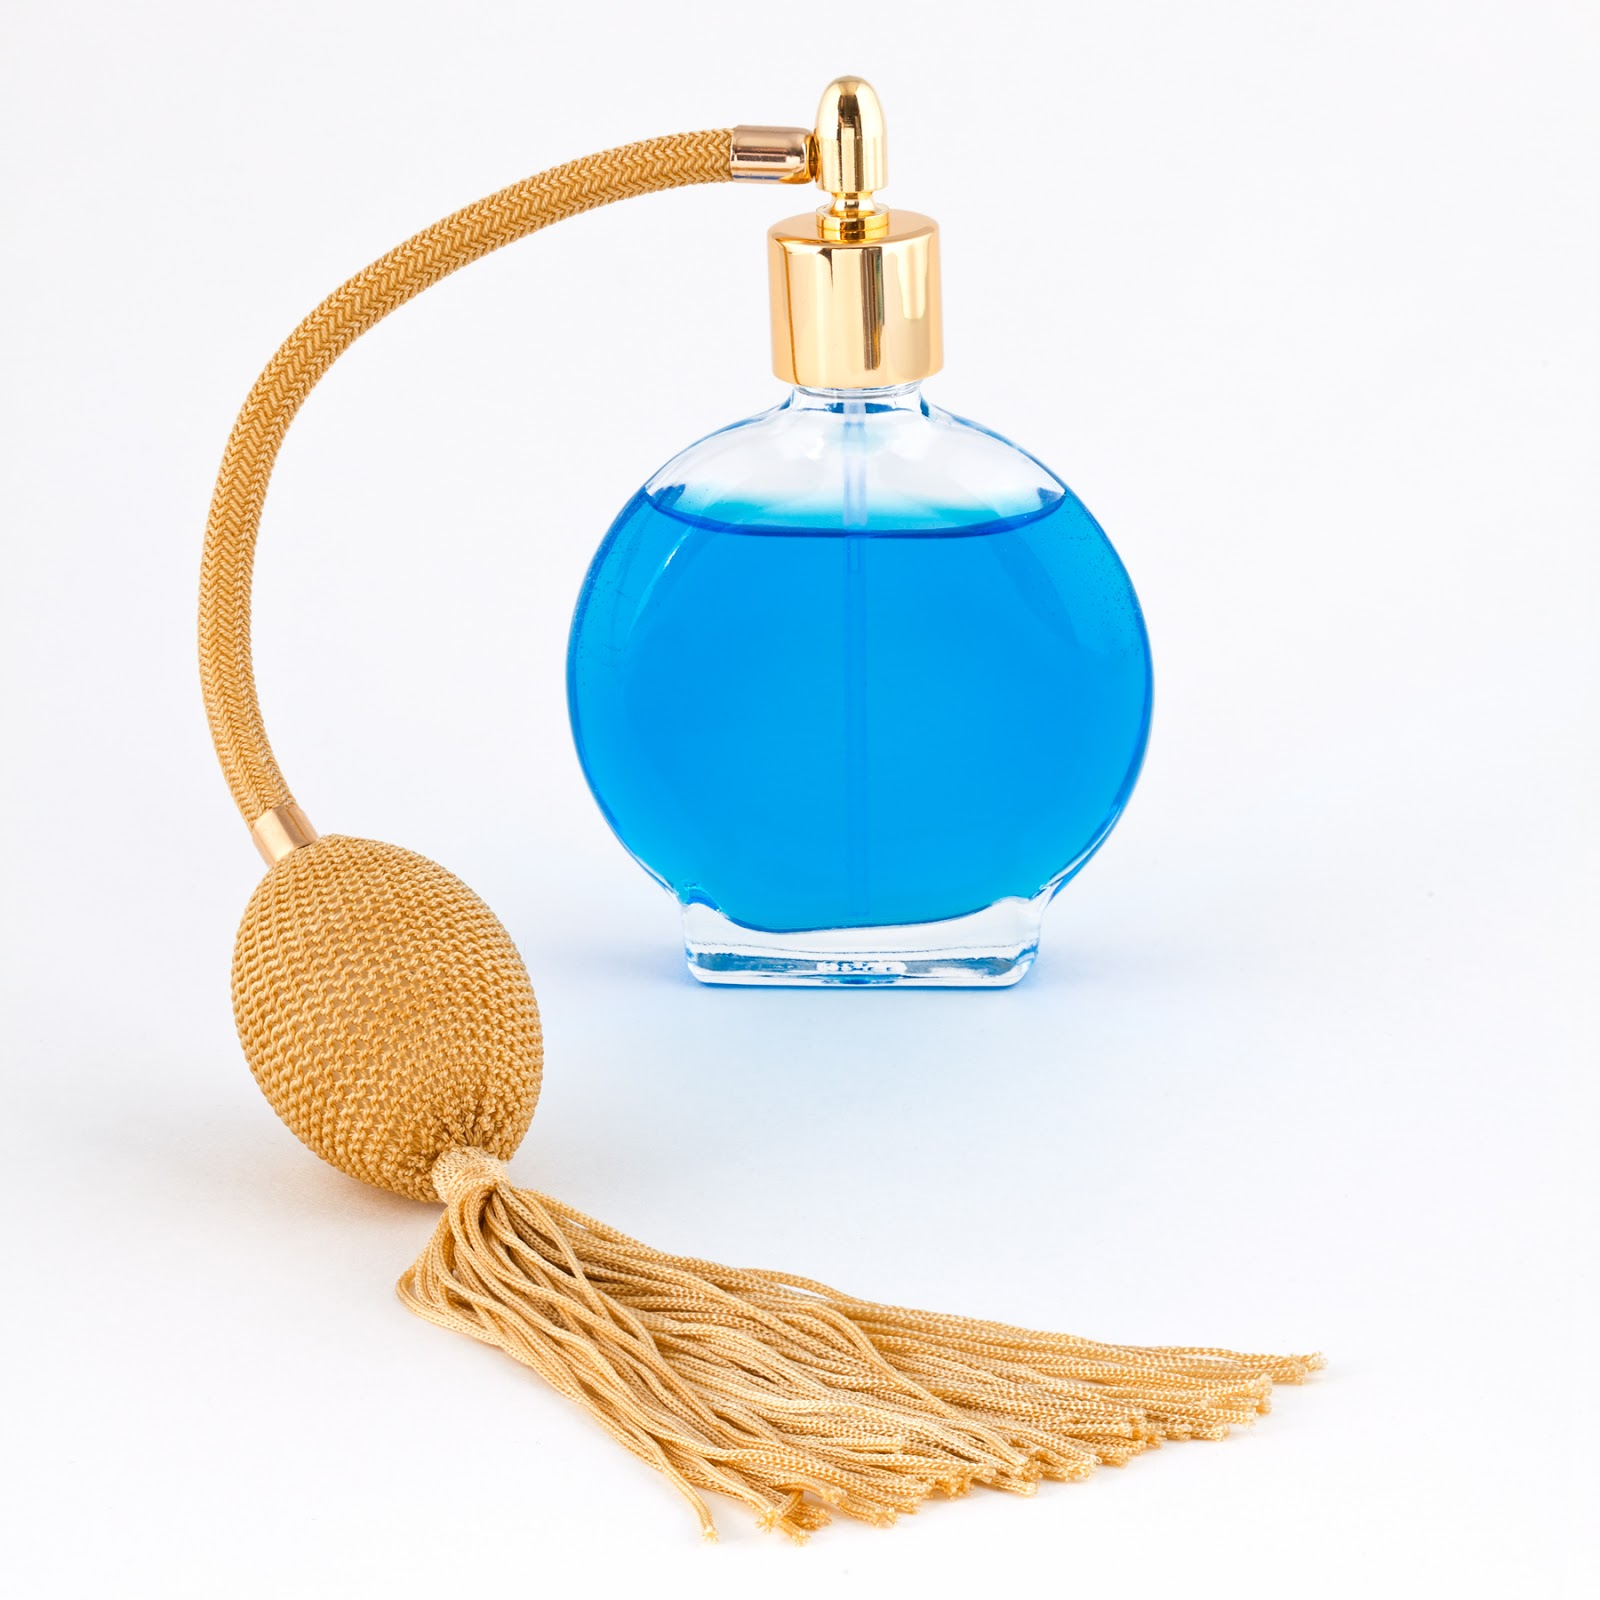 diferentes tipos de perfumes